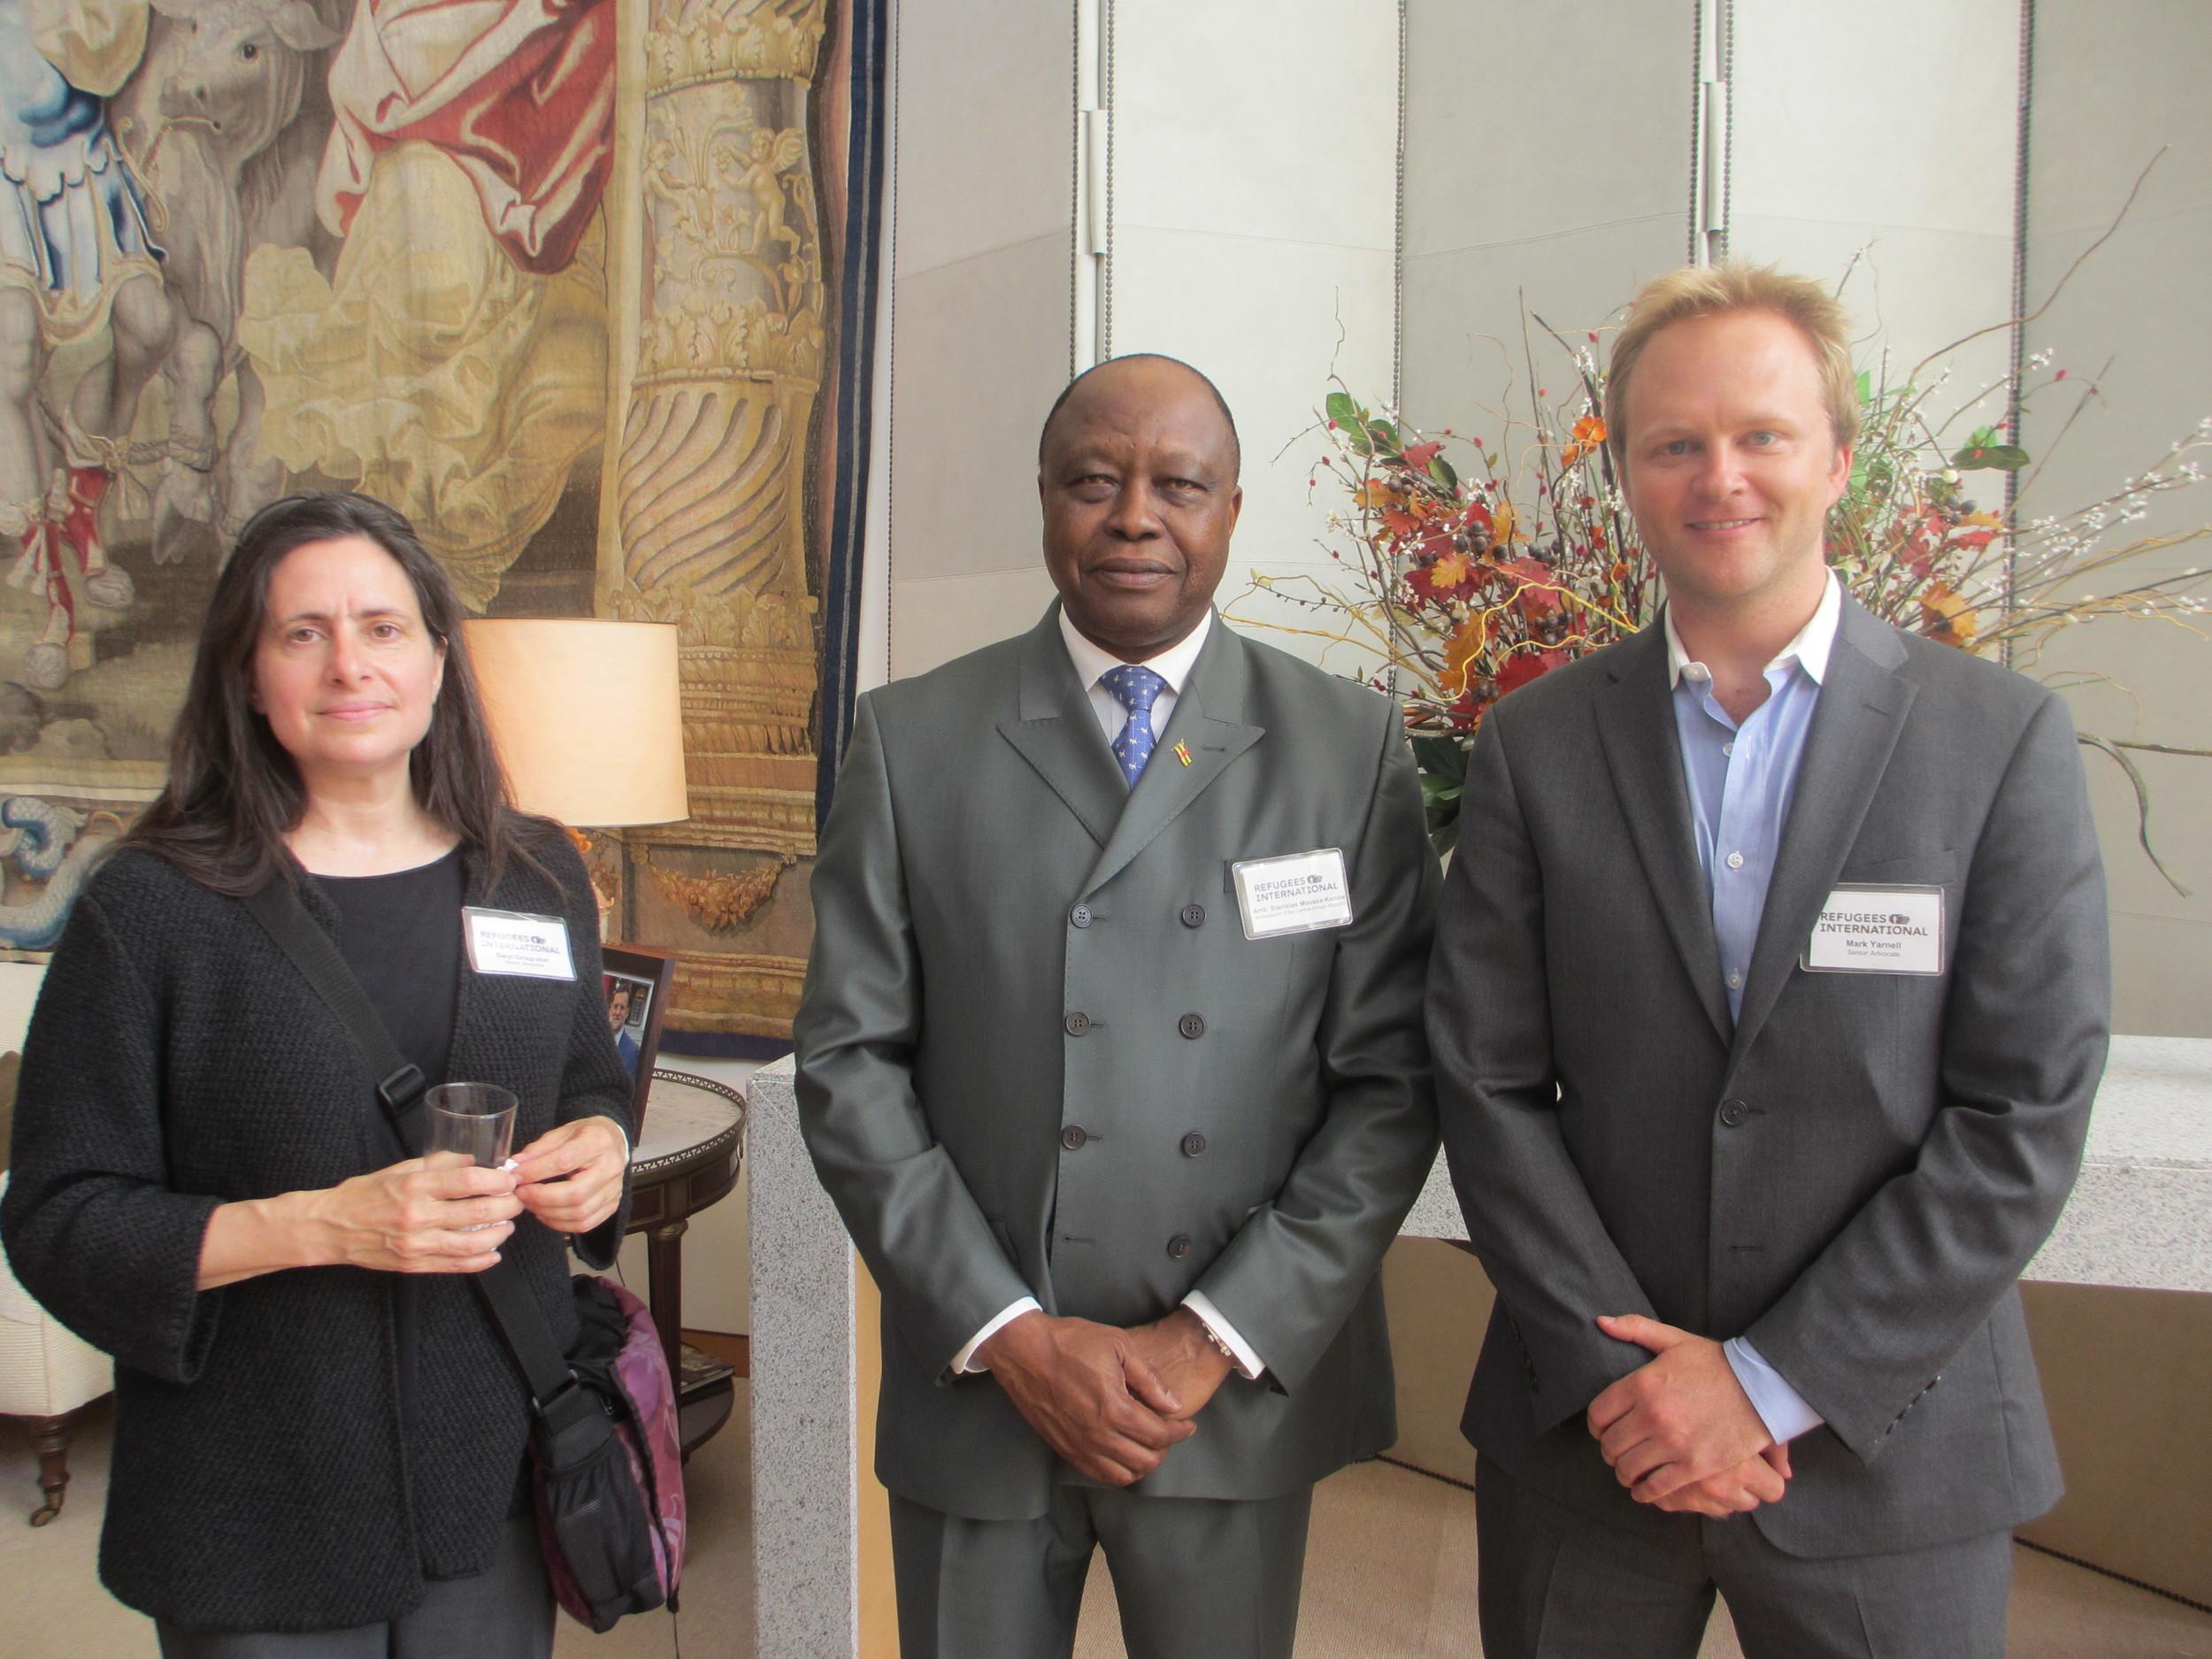 Refugees International Senior Advocate Daryl Grisgraber, Ambassador Stanislas Moussa-Kembe of the Central African Republic, and RI Senior Advocate Mark Yarnell